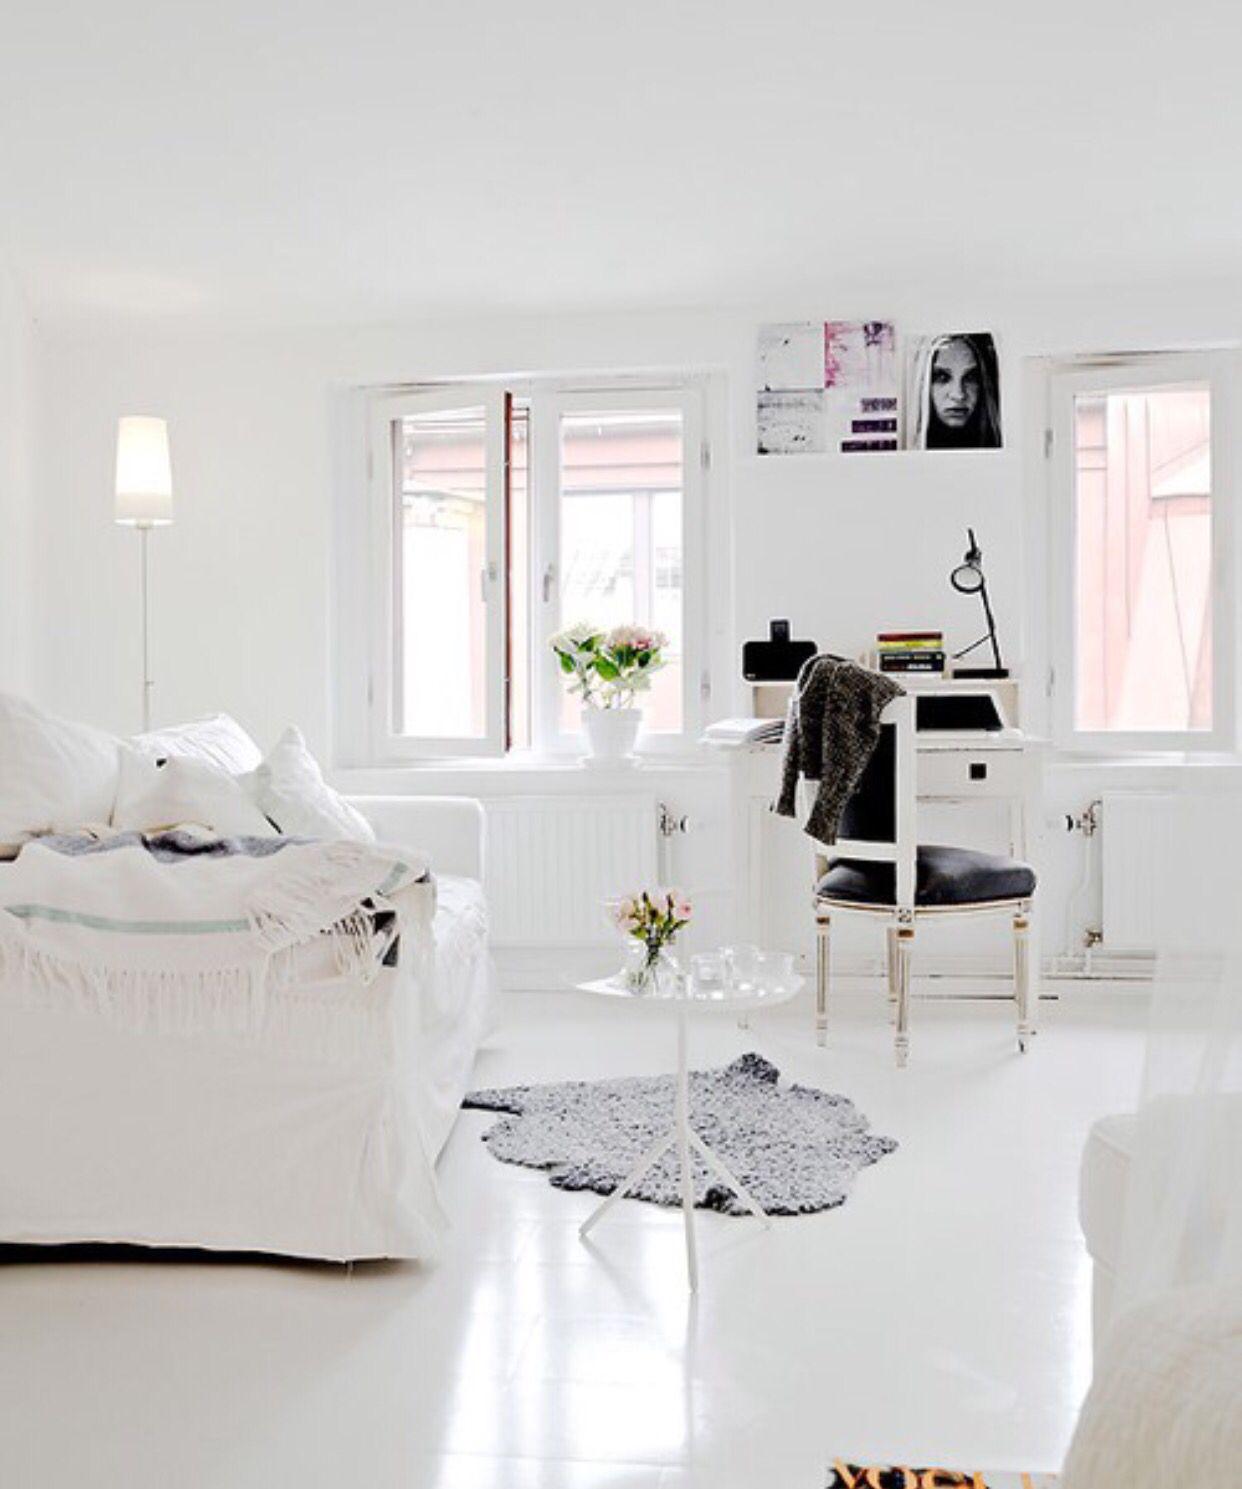 Pin By Natalie Baskin On Bedroom Decor Living Room Inspiration